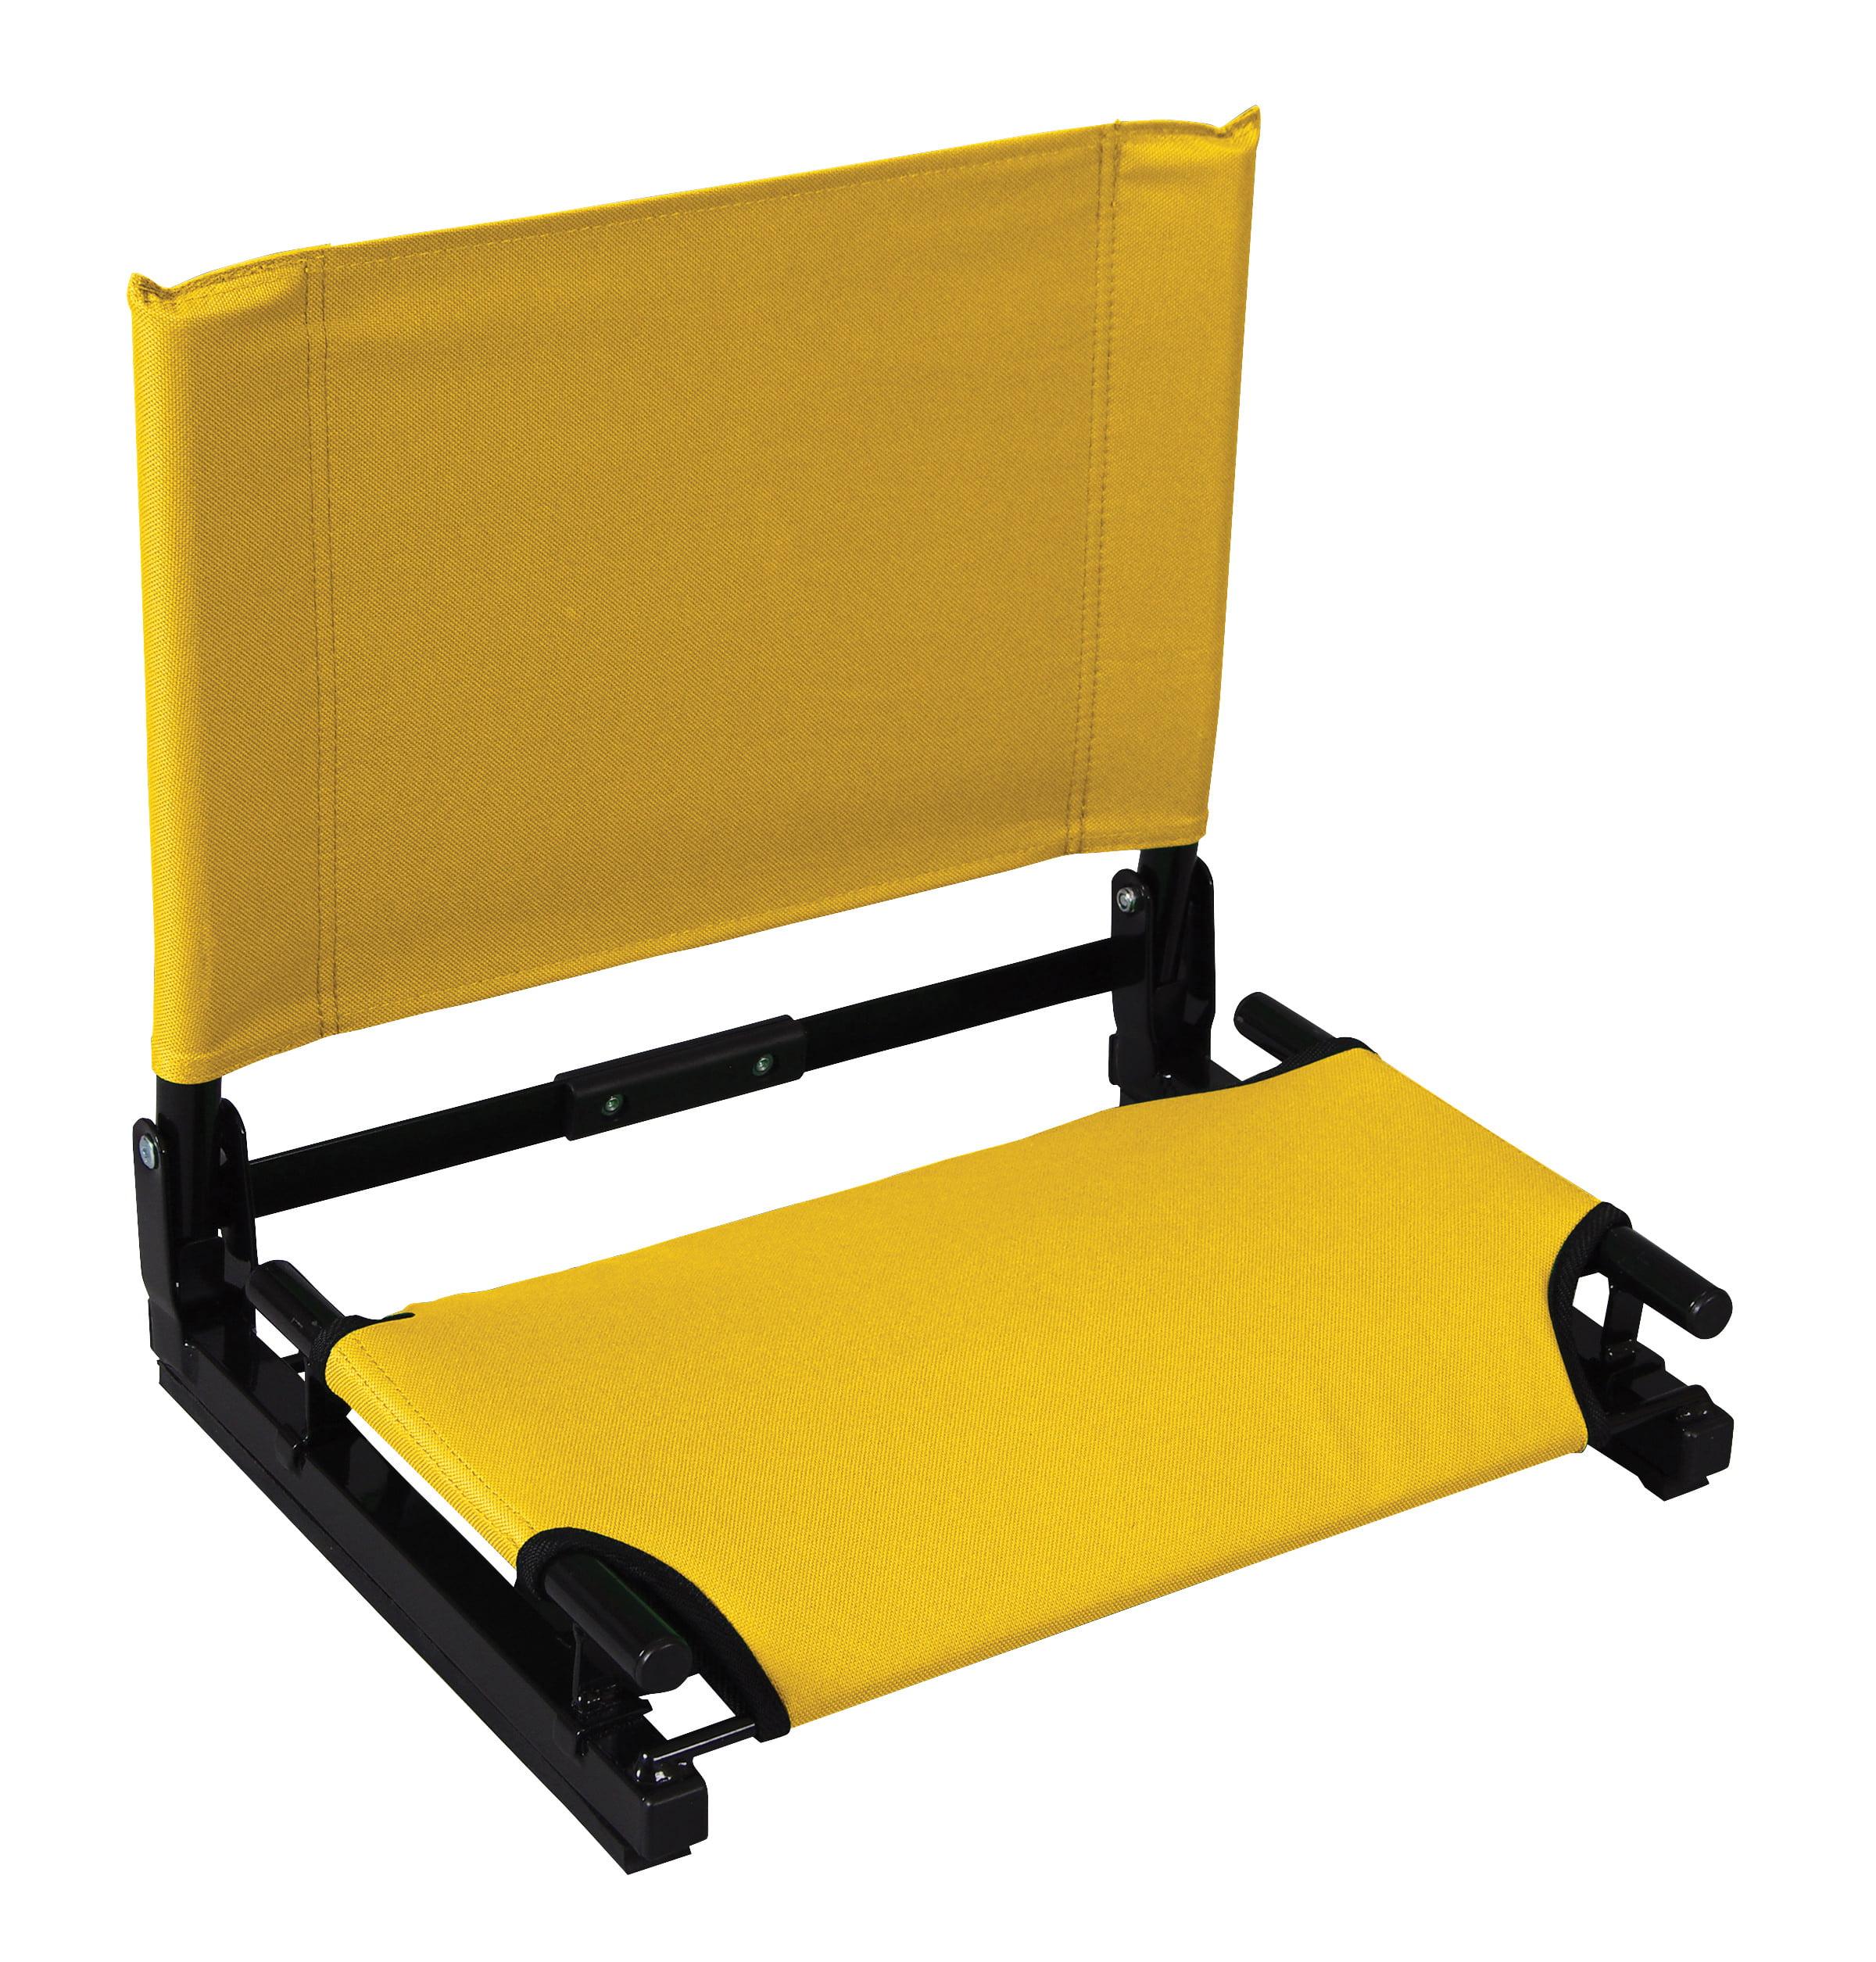 Gamechanger™ Stadium Chair - Black